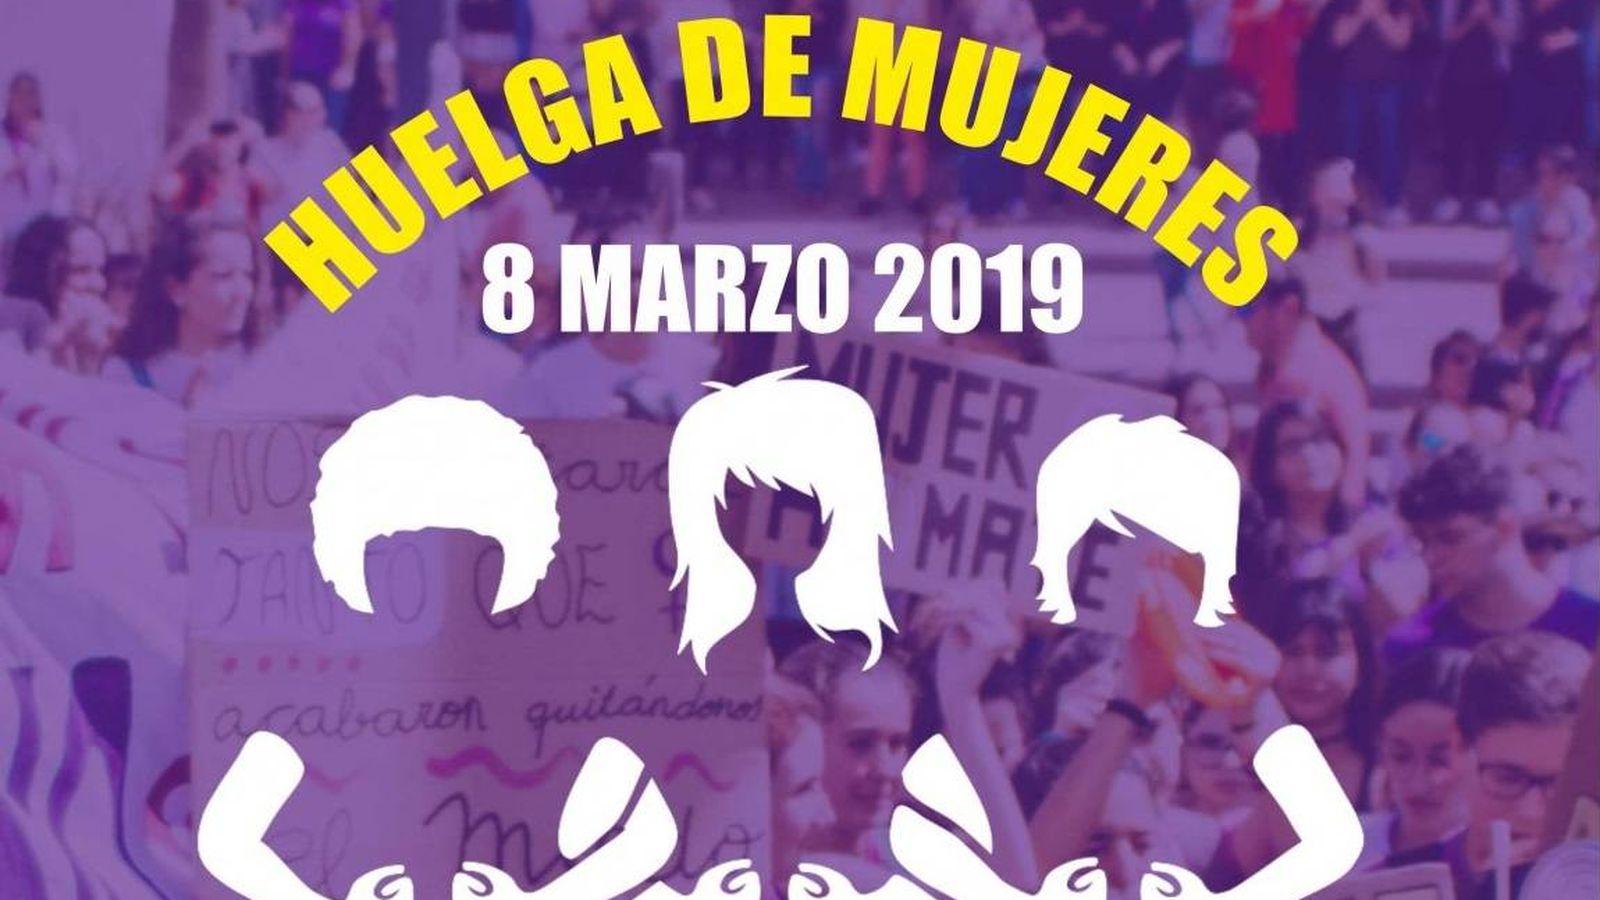 Foto: Huelga feminista del 8 de marzo de 2019 (Coordinadora Feminista)